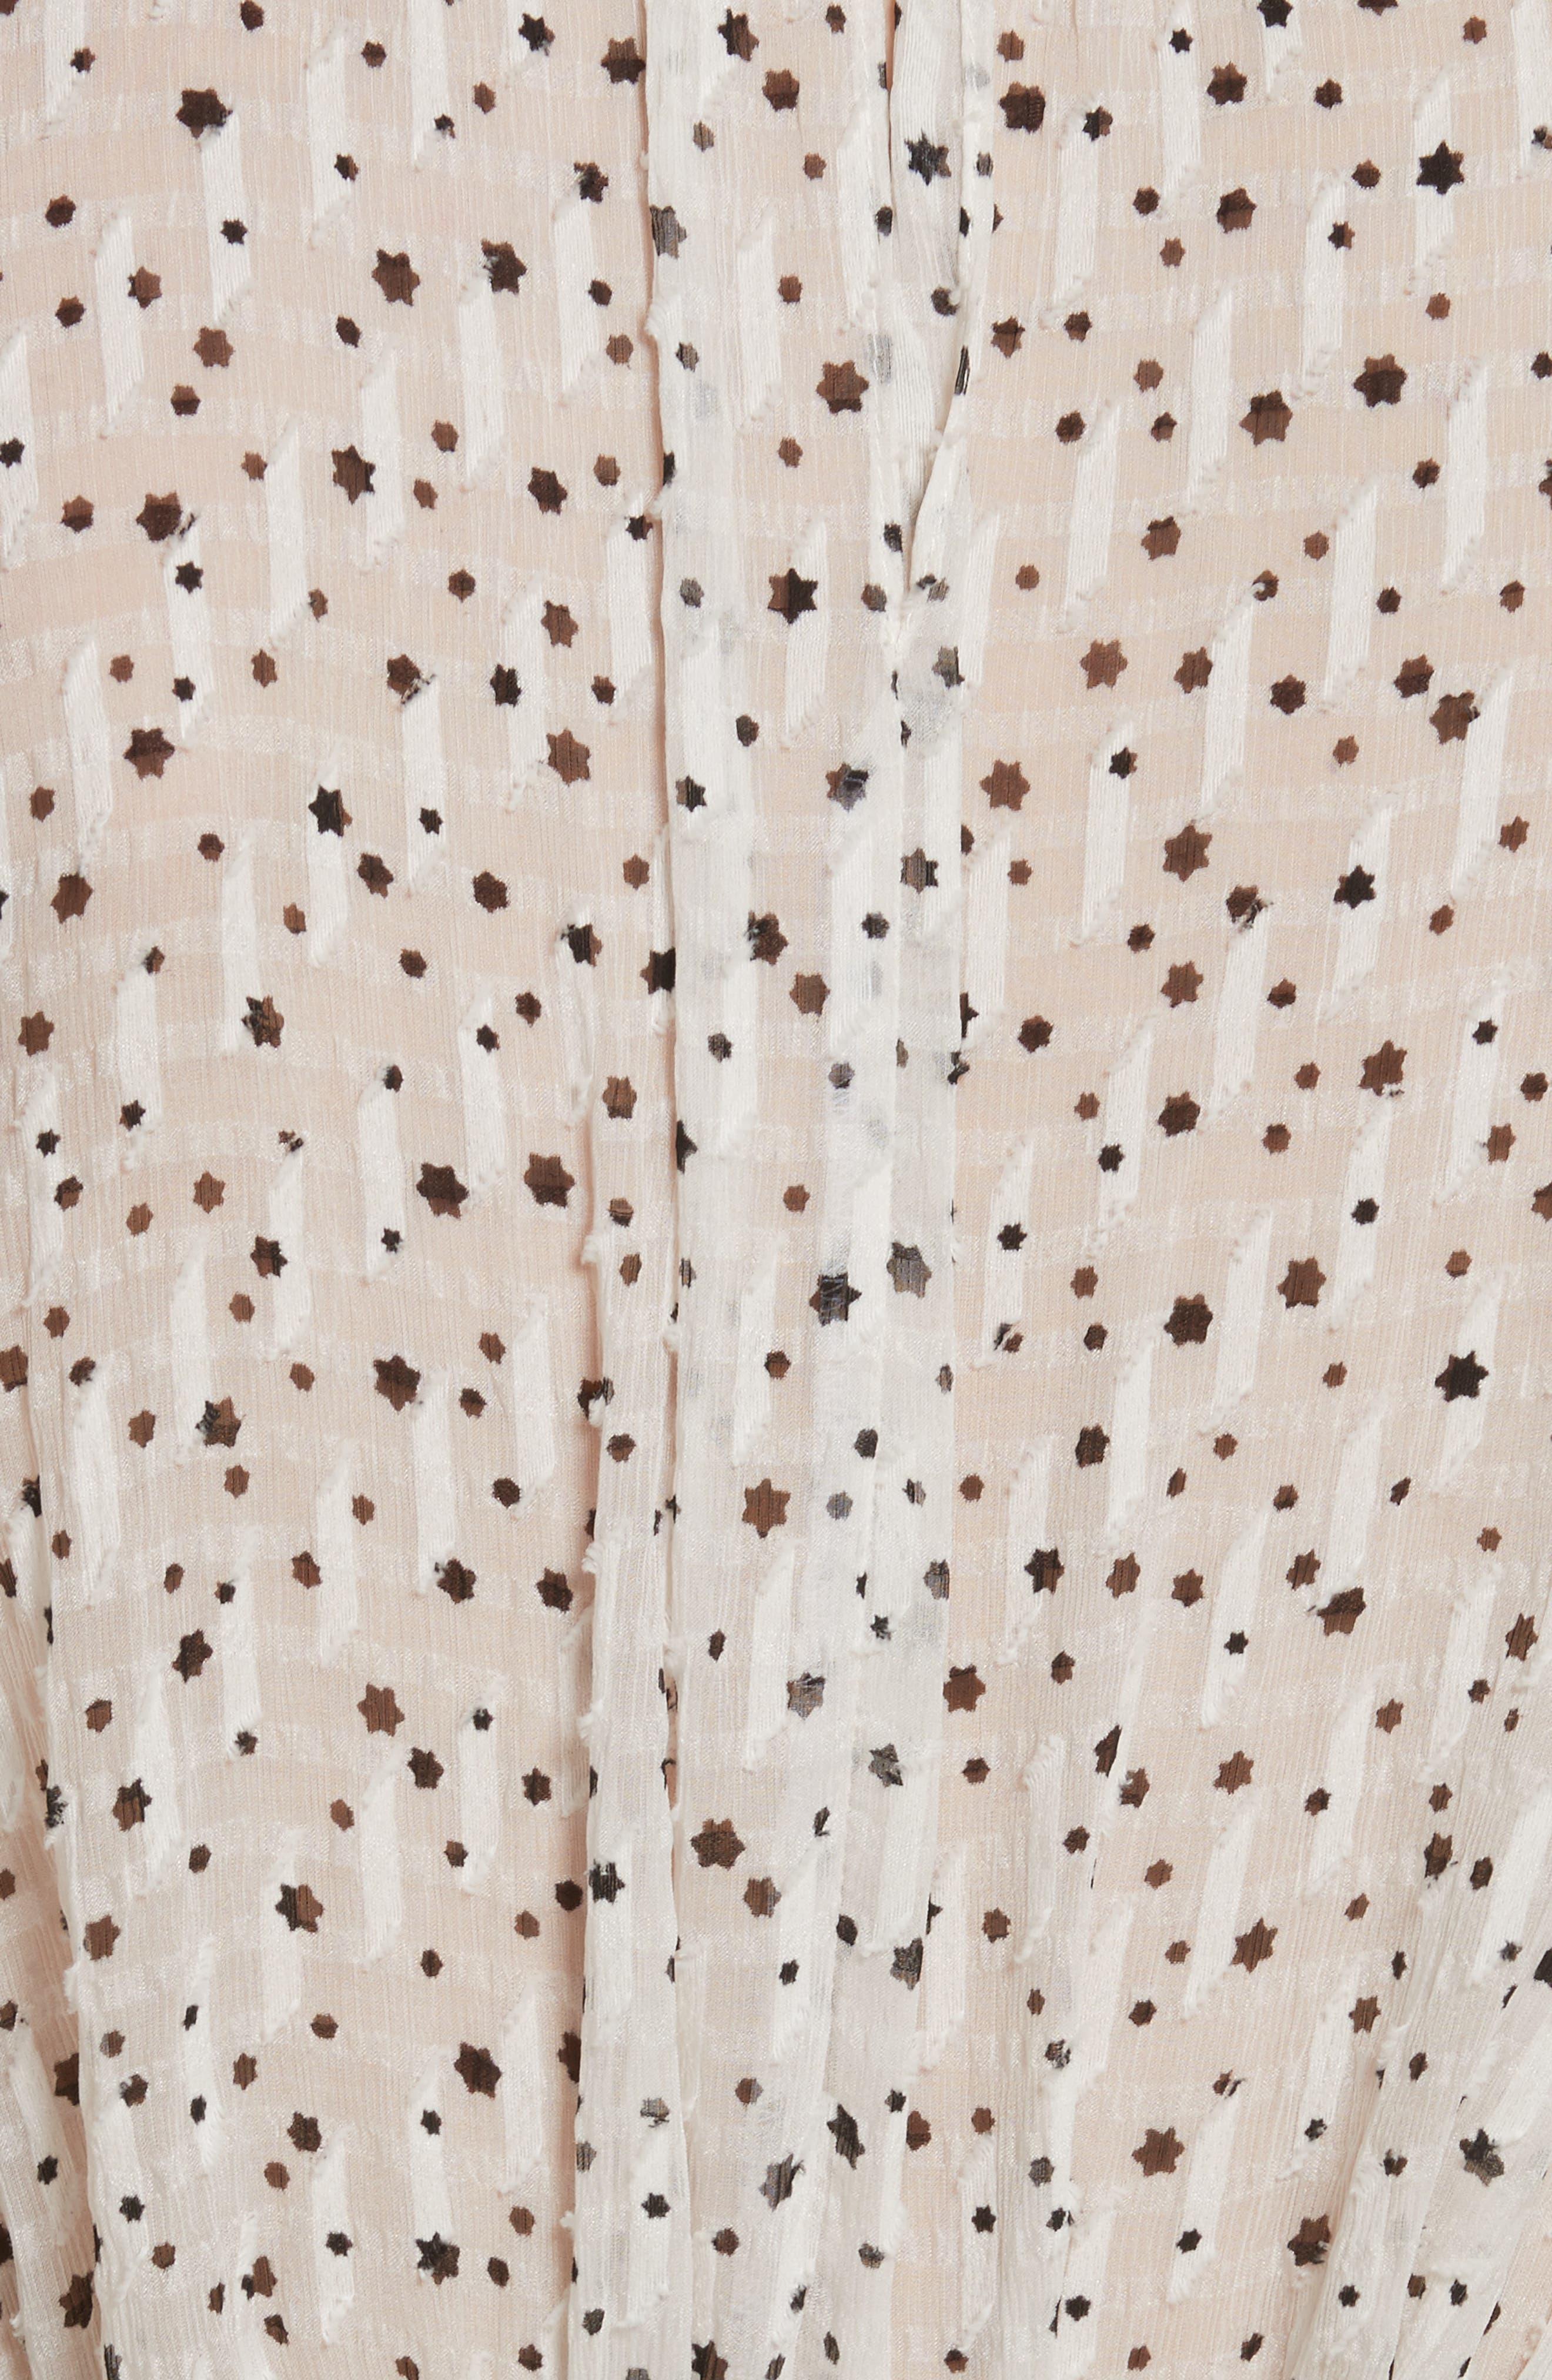 Star Tie Silk Blend Blouse,                             Alternate thumbnail 5, color,                             Snow Combo